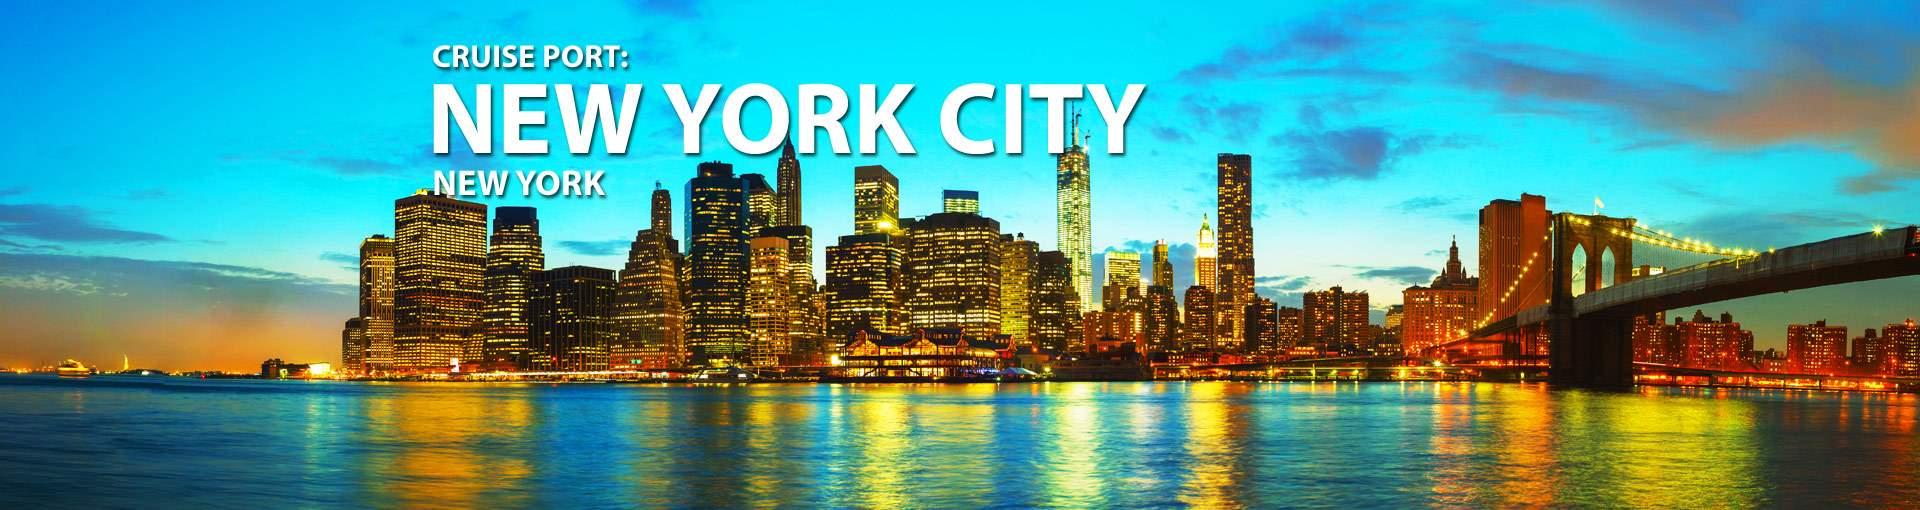 Cruise Port: New York City, New York